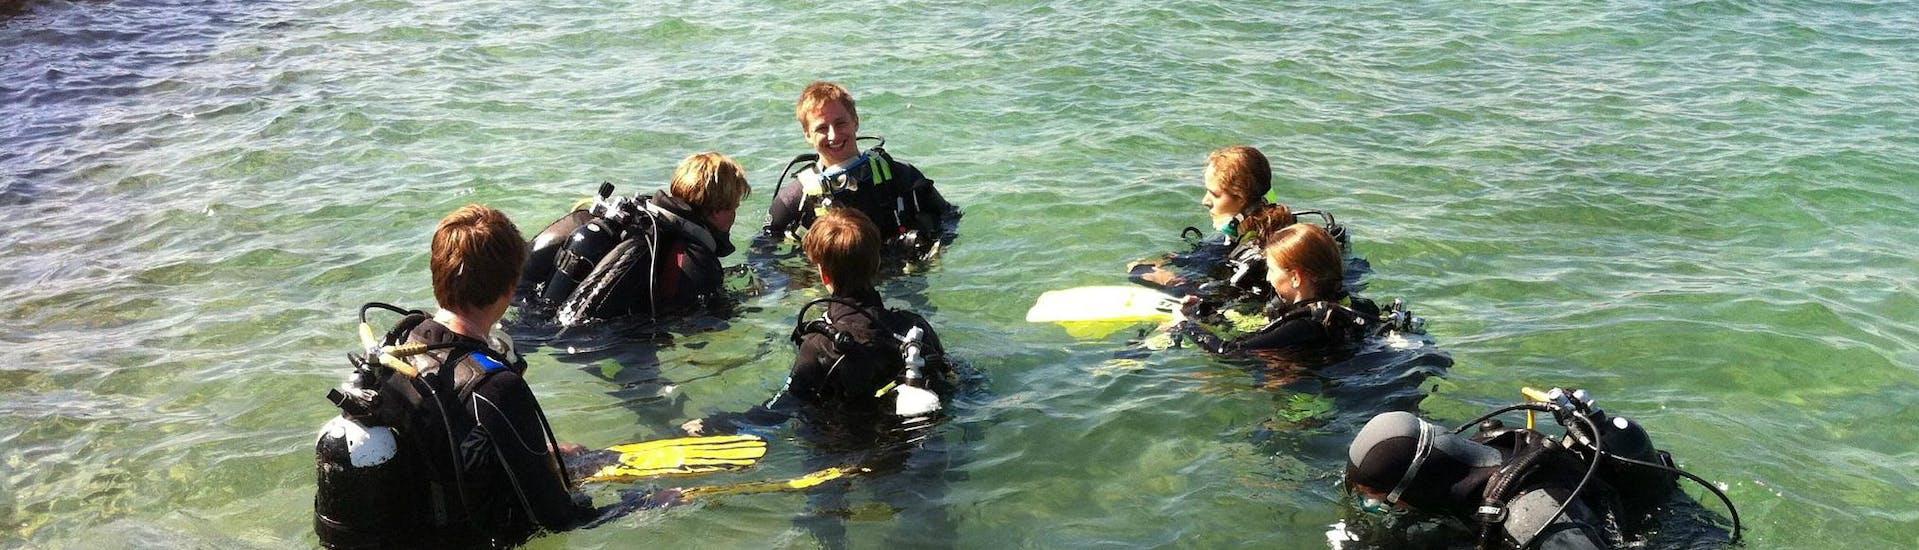 CMAS* Scuba Diving Course in Malinska for Beginners